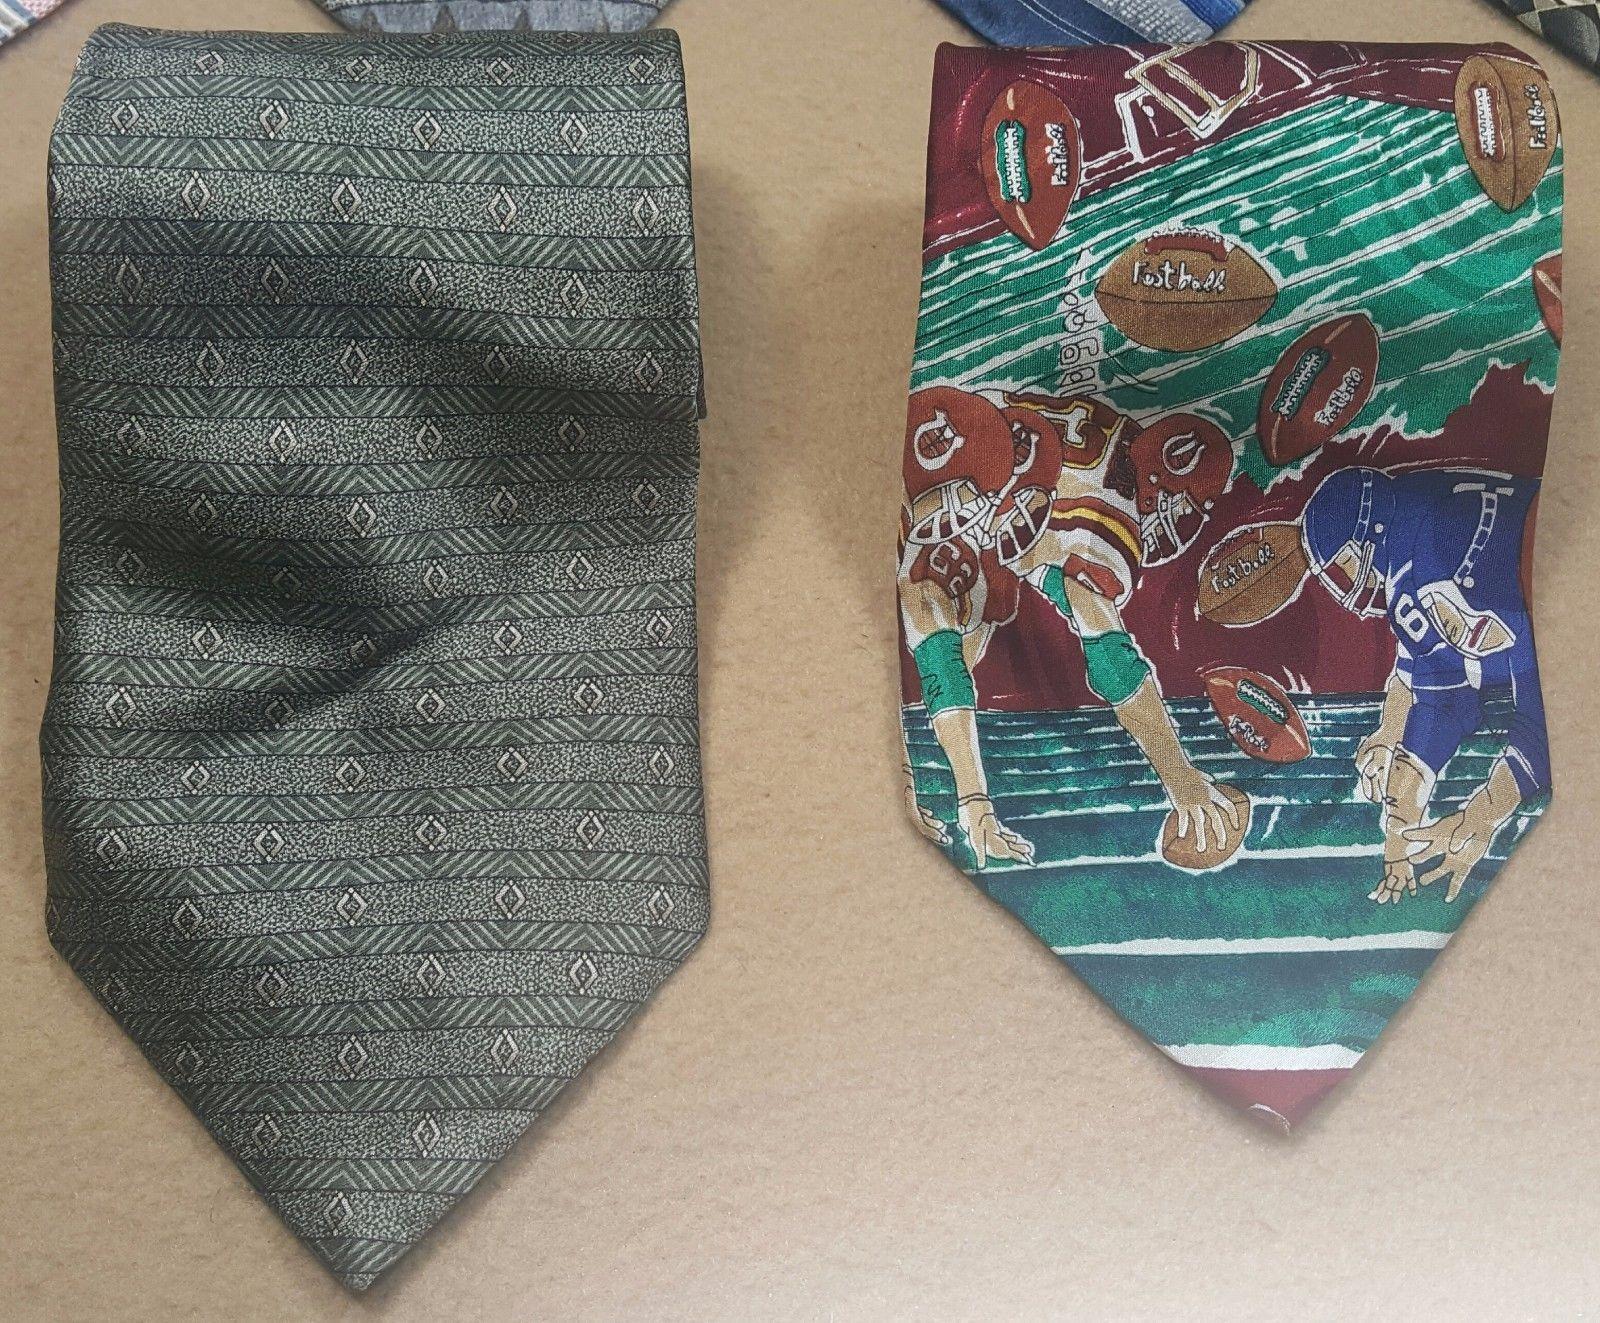 größte Auswahl an beste Seite Designermode Pierre Cardin Silk Ties Striped, Geometric, and 40 similar items